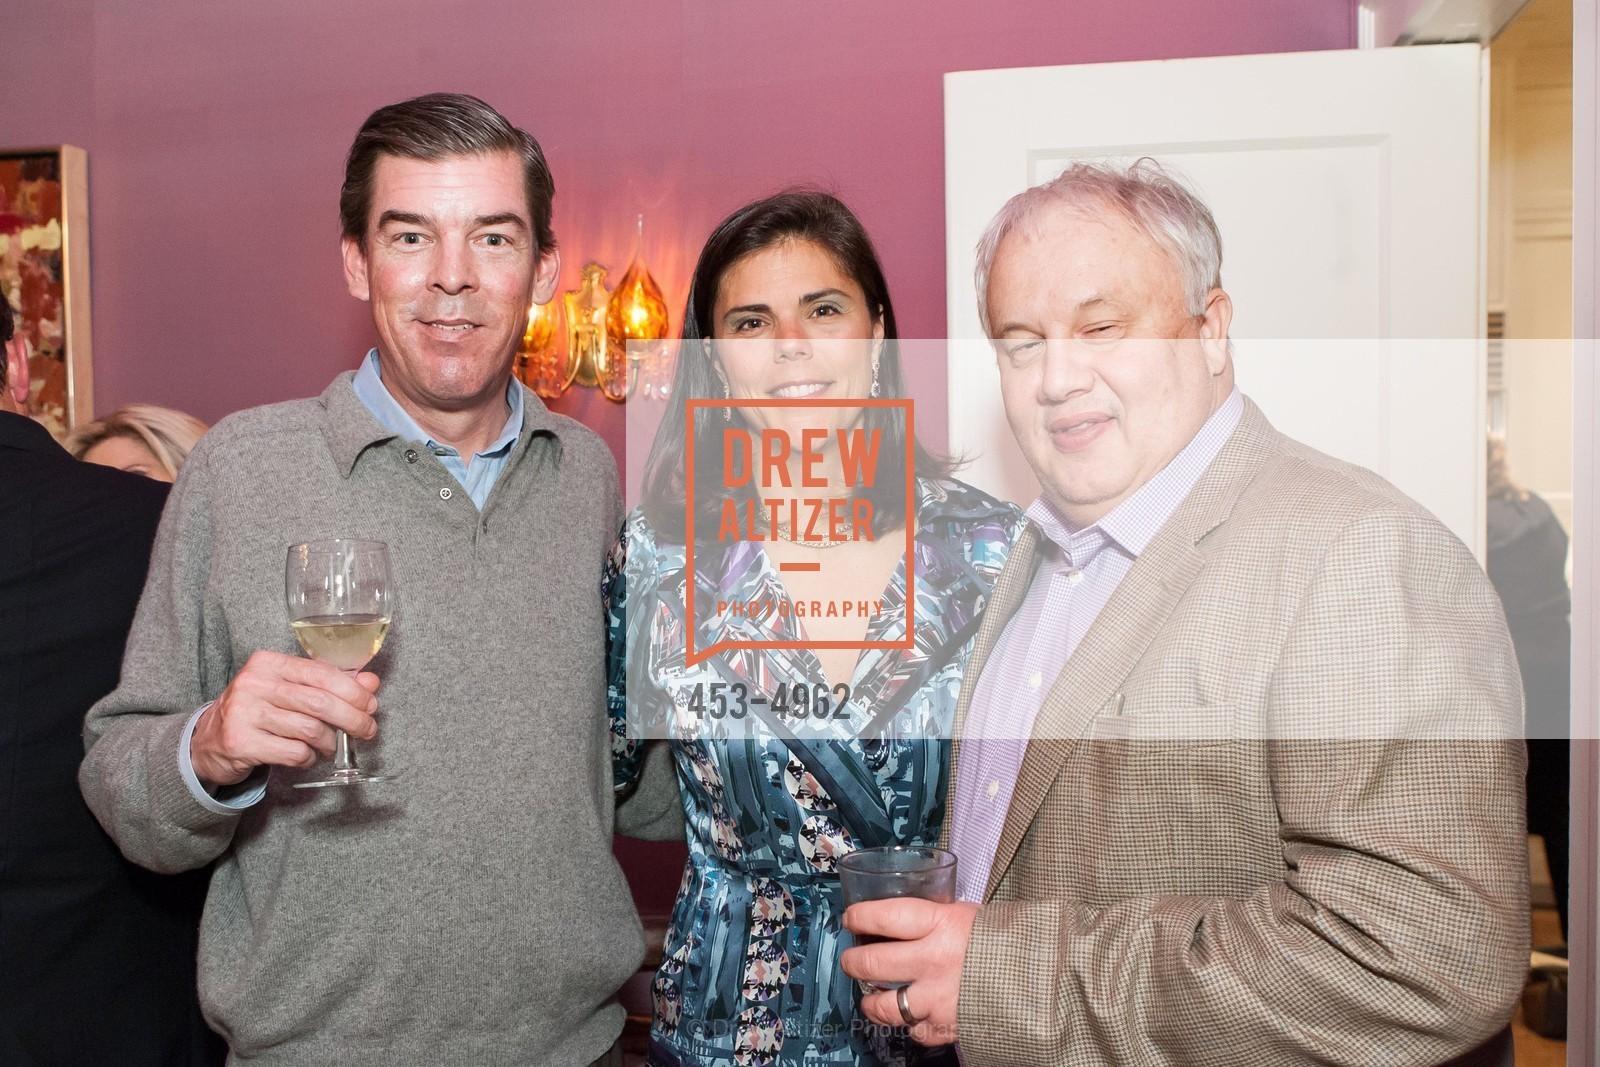 Craig Fenton, Tricia Knapp, Bruno Tapolsky, Photo #453-4962